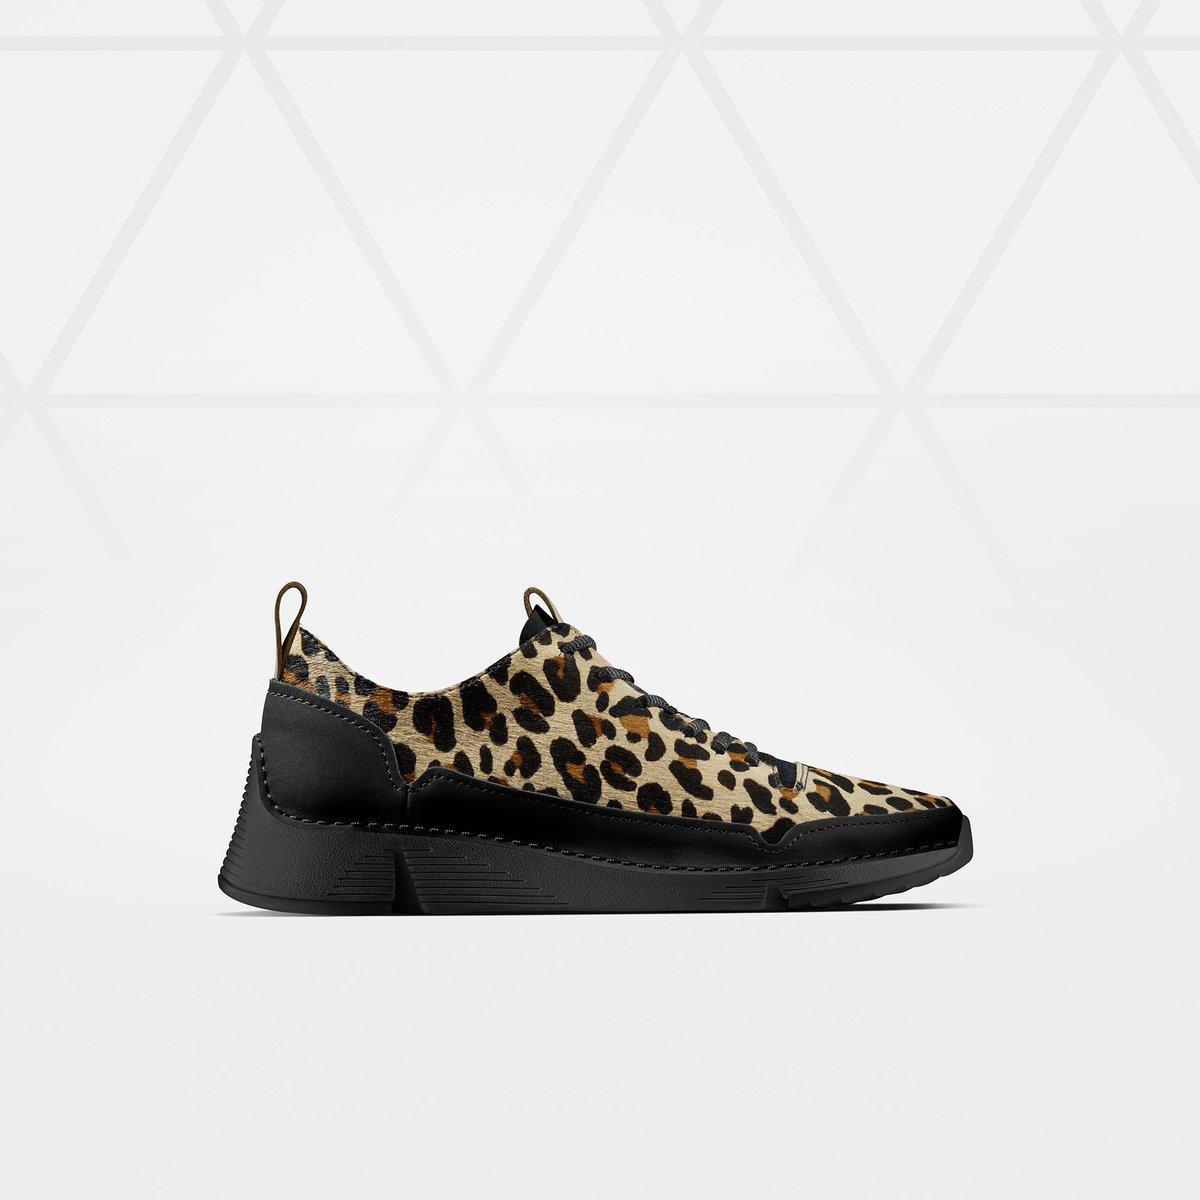 c438862297 Clarks Shoes (@clarksshoes) | Twitter